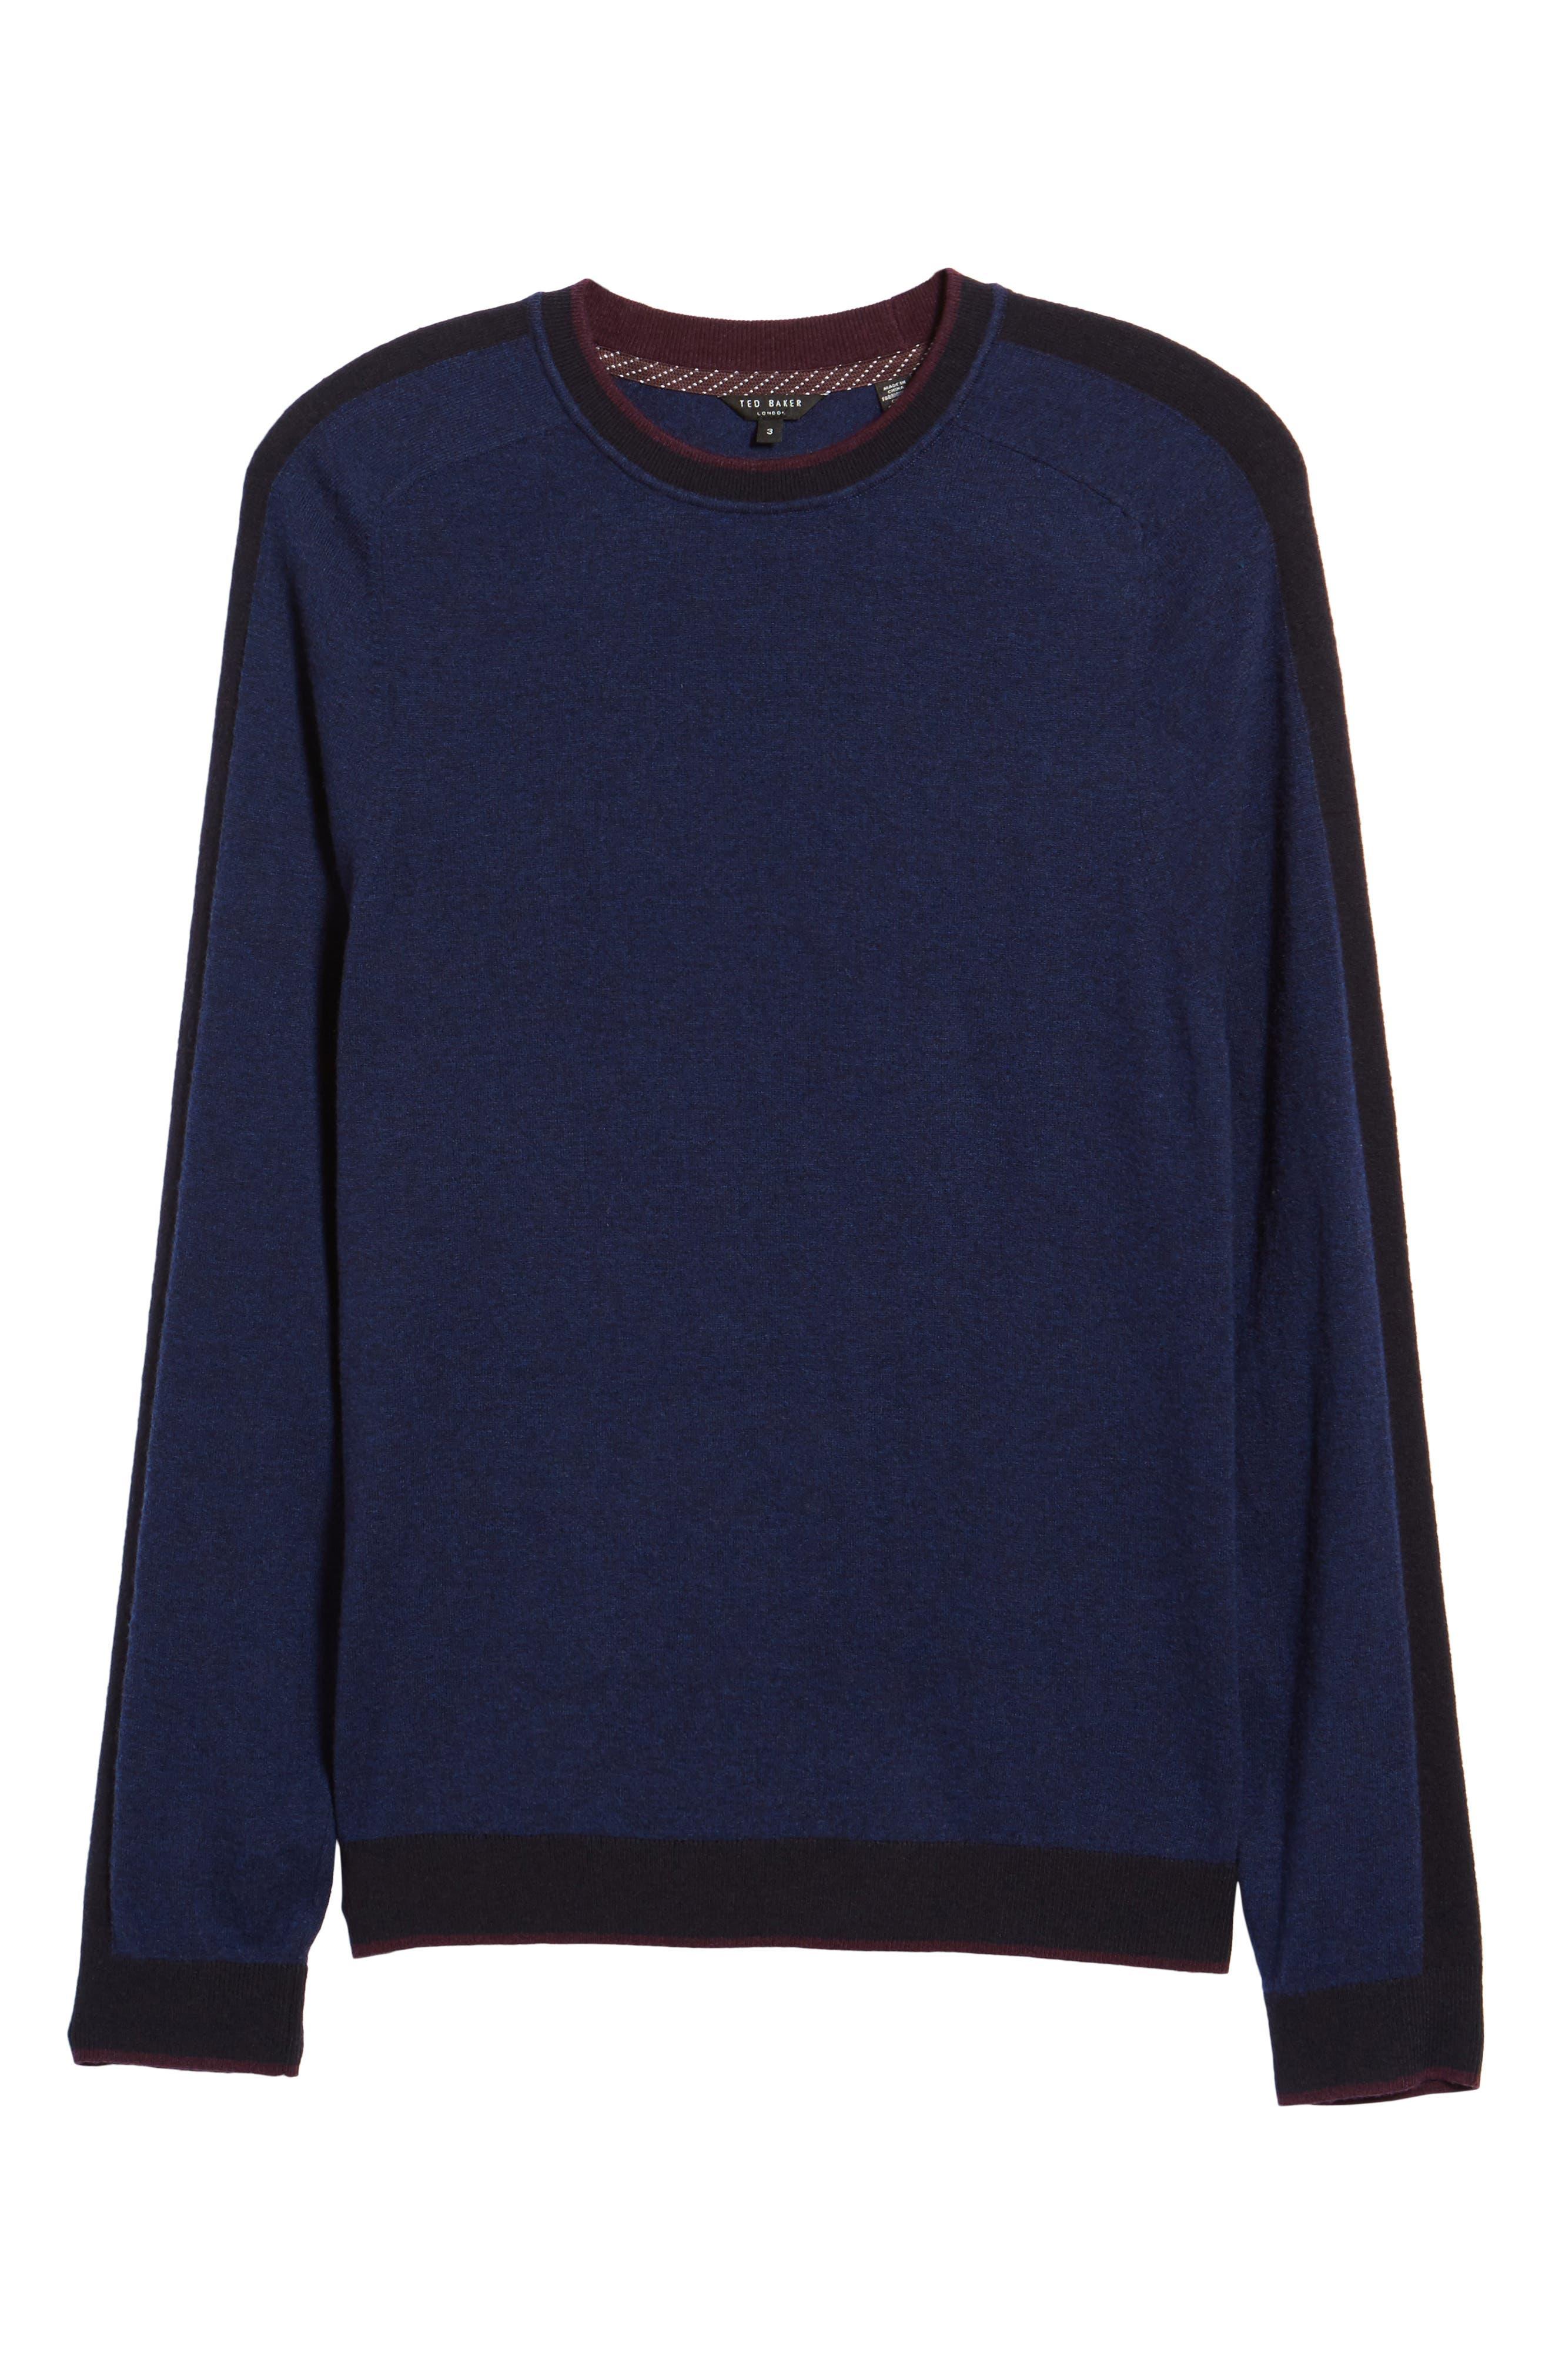 Norpol Crewneck Sweater,                             Alternate thumbnail 23, color,